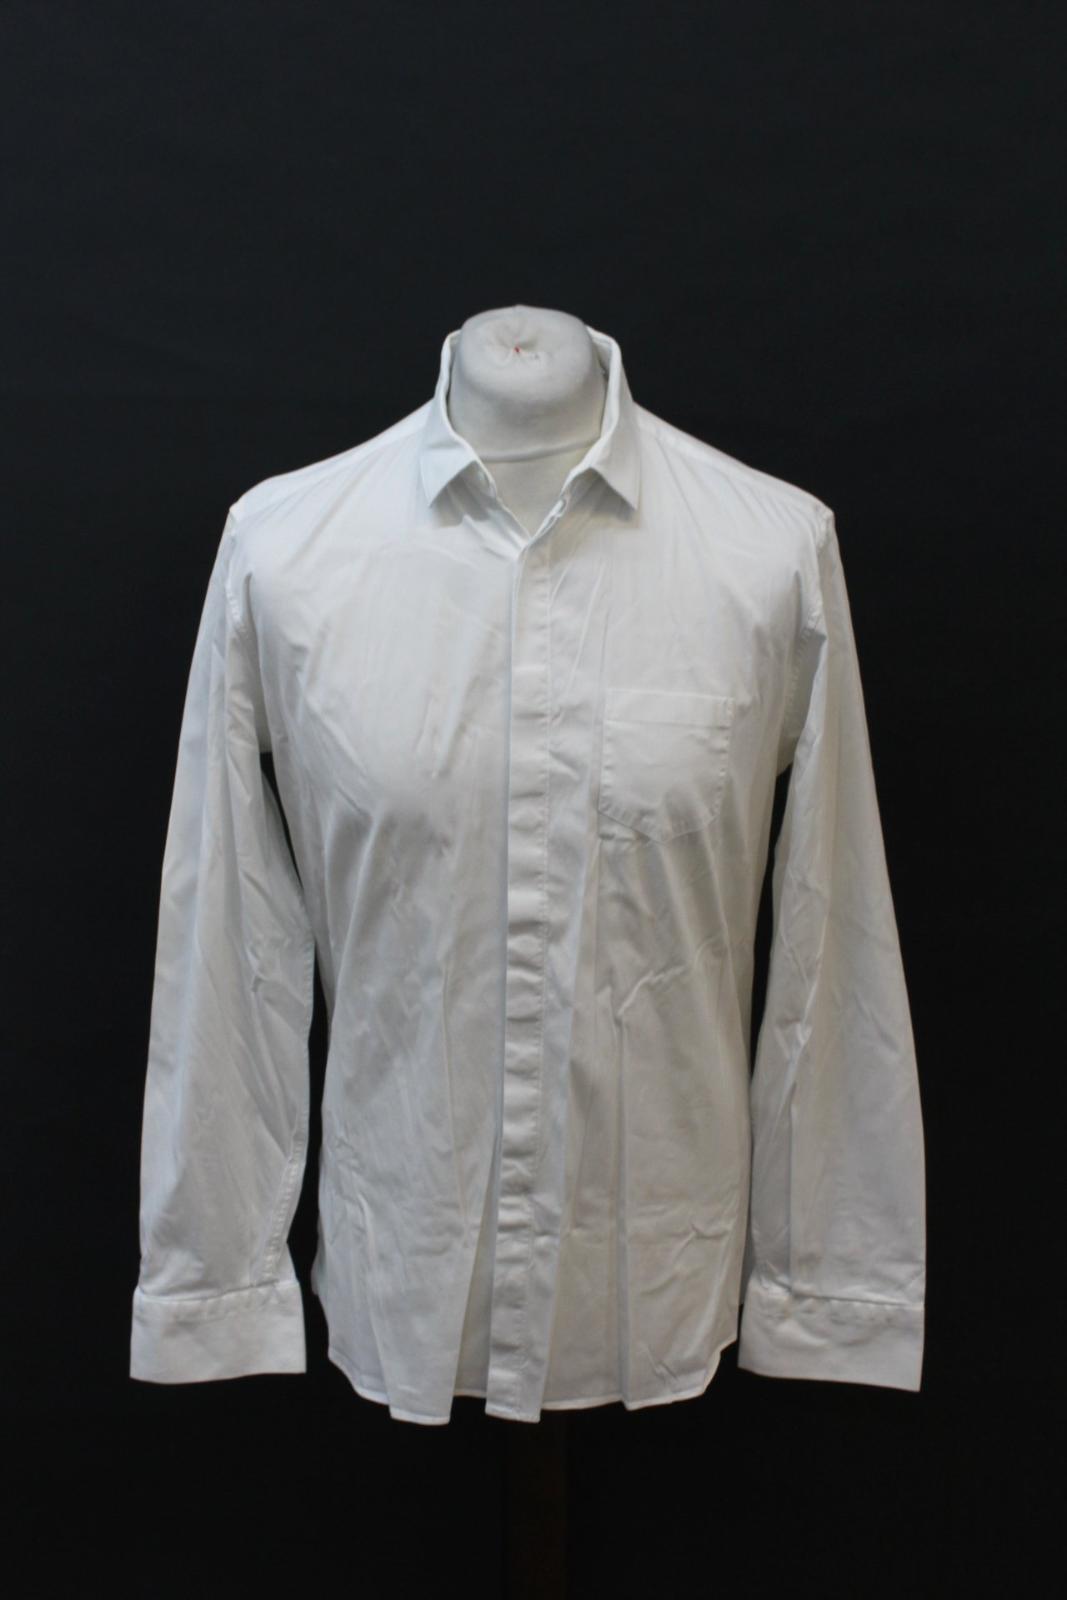 NEIL-BARRETT-Men-039-s-White-Cotton-Blend-Slim-Fit-Formal-Shirt-Collar-16-5-034-42cm miniatura 10